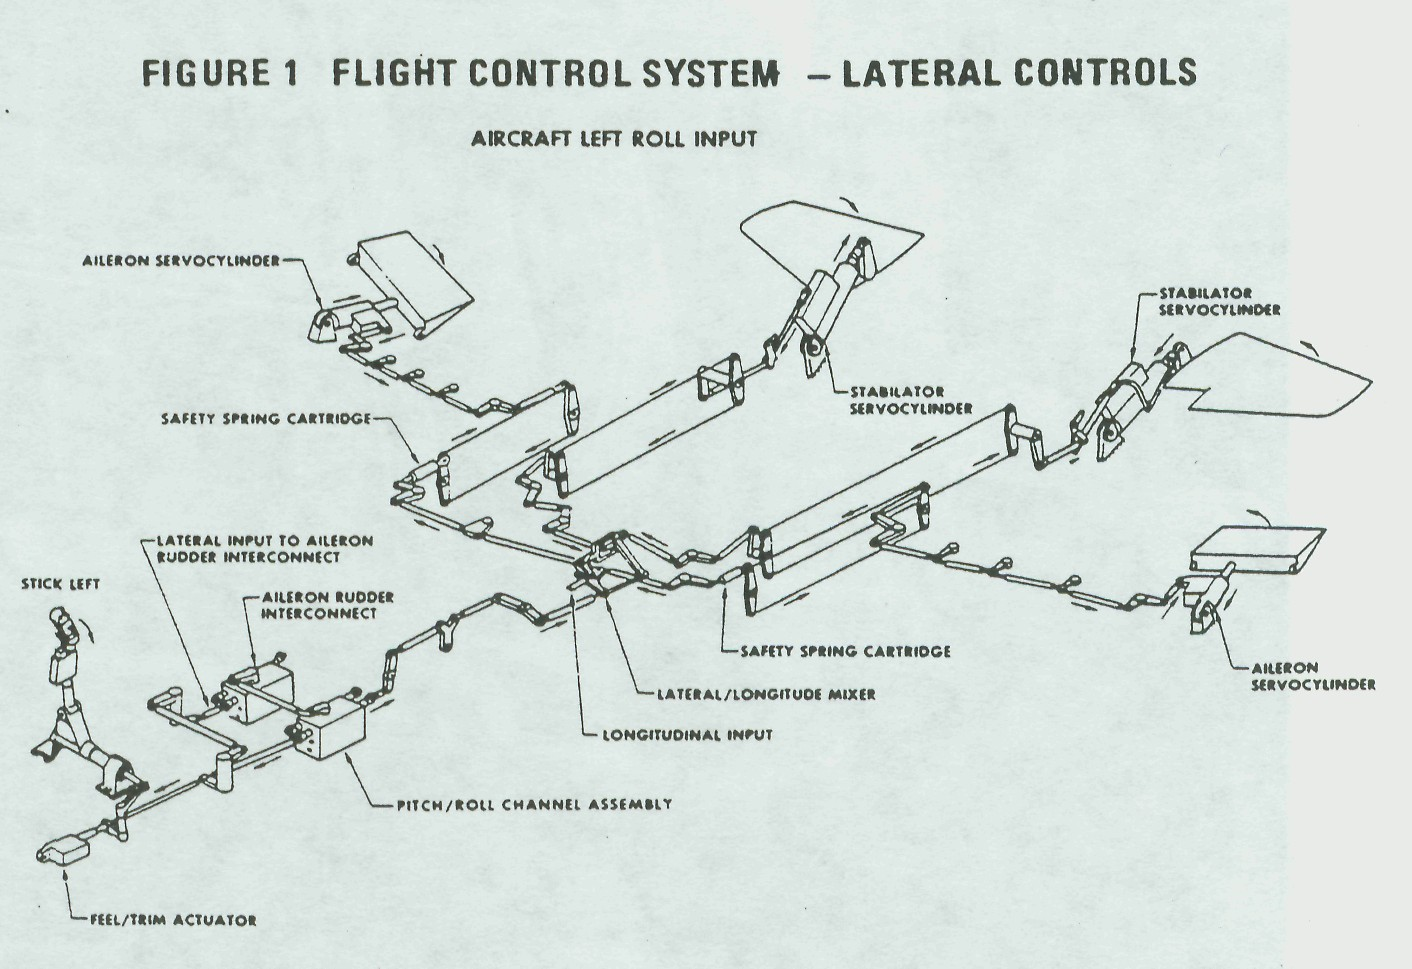 The F 15 Flight Control System